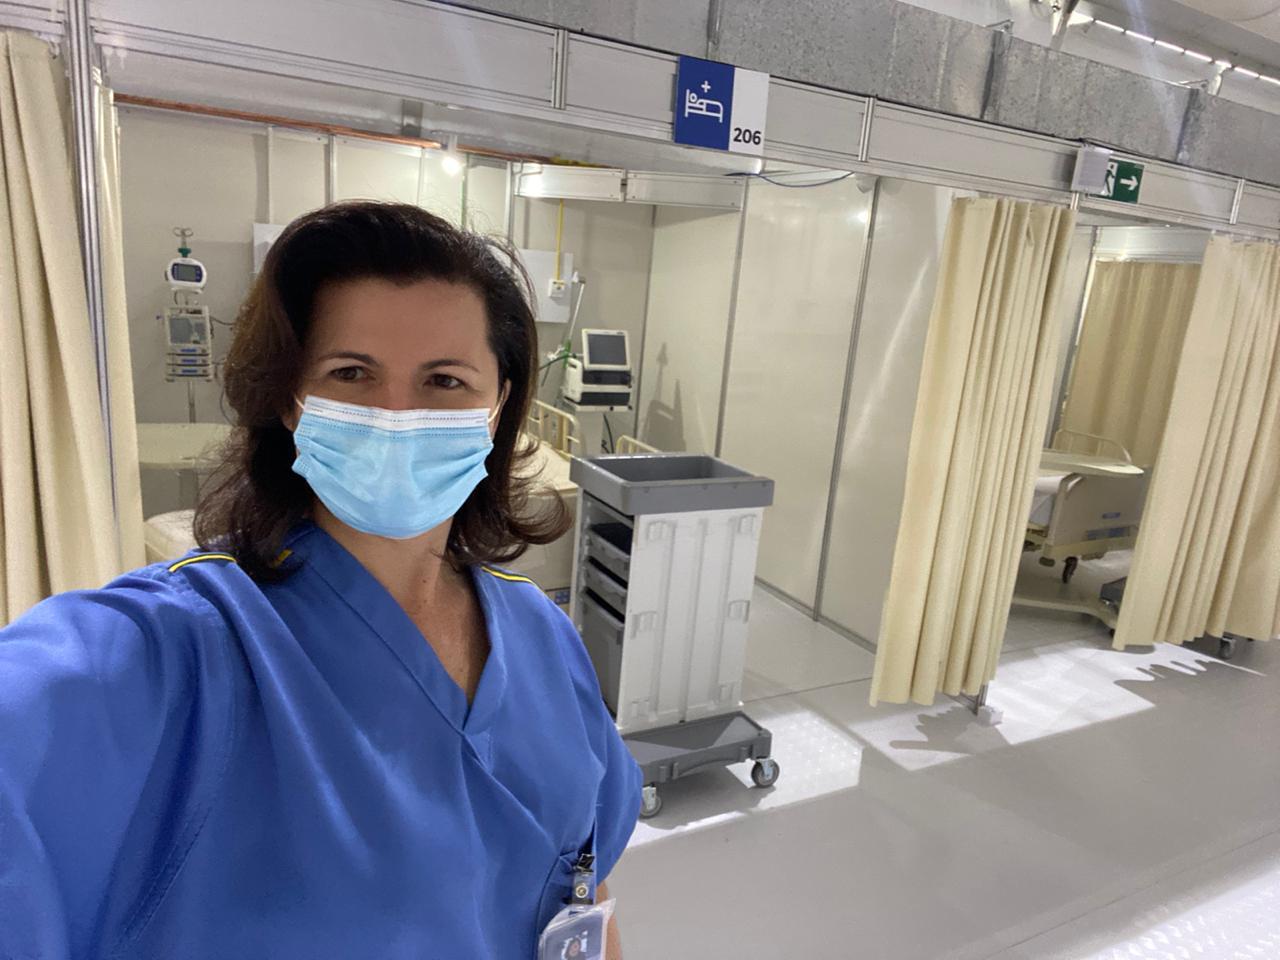 Clarice's field hospital